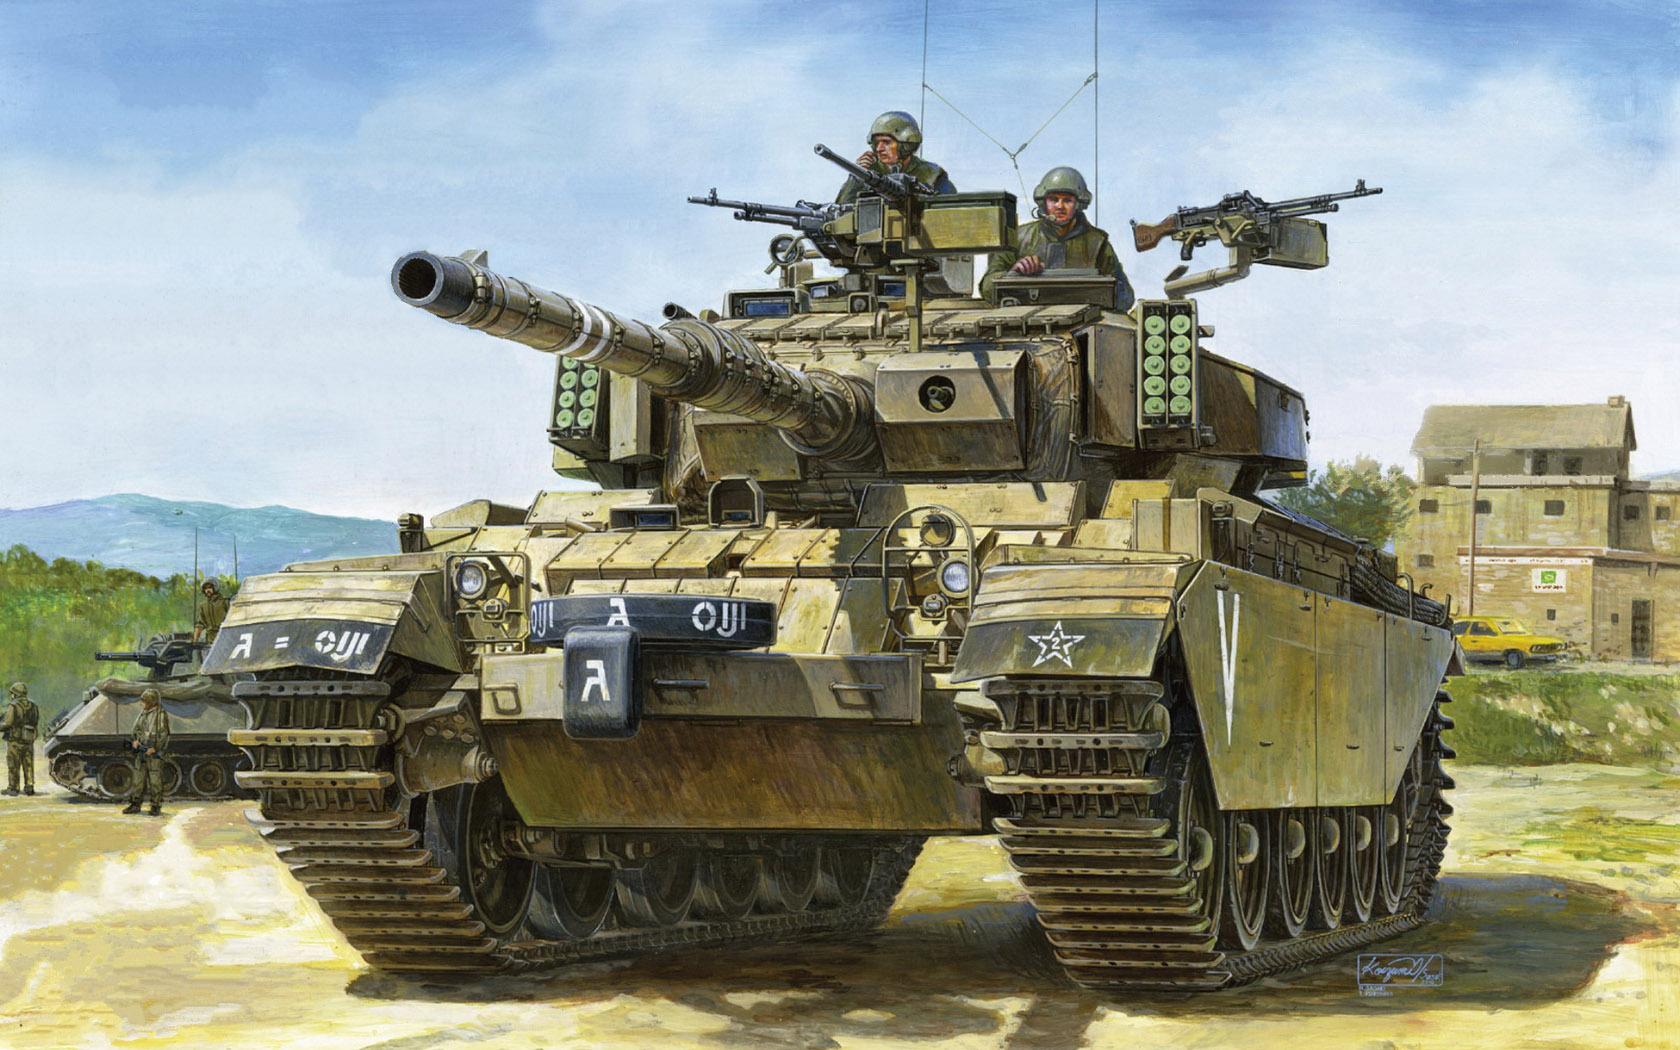 рисунок IDF Sho't Kal Dalet w/Battering Ram